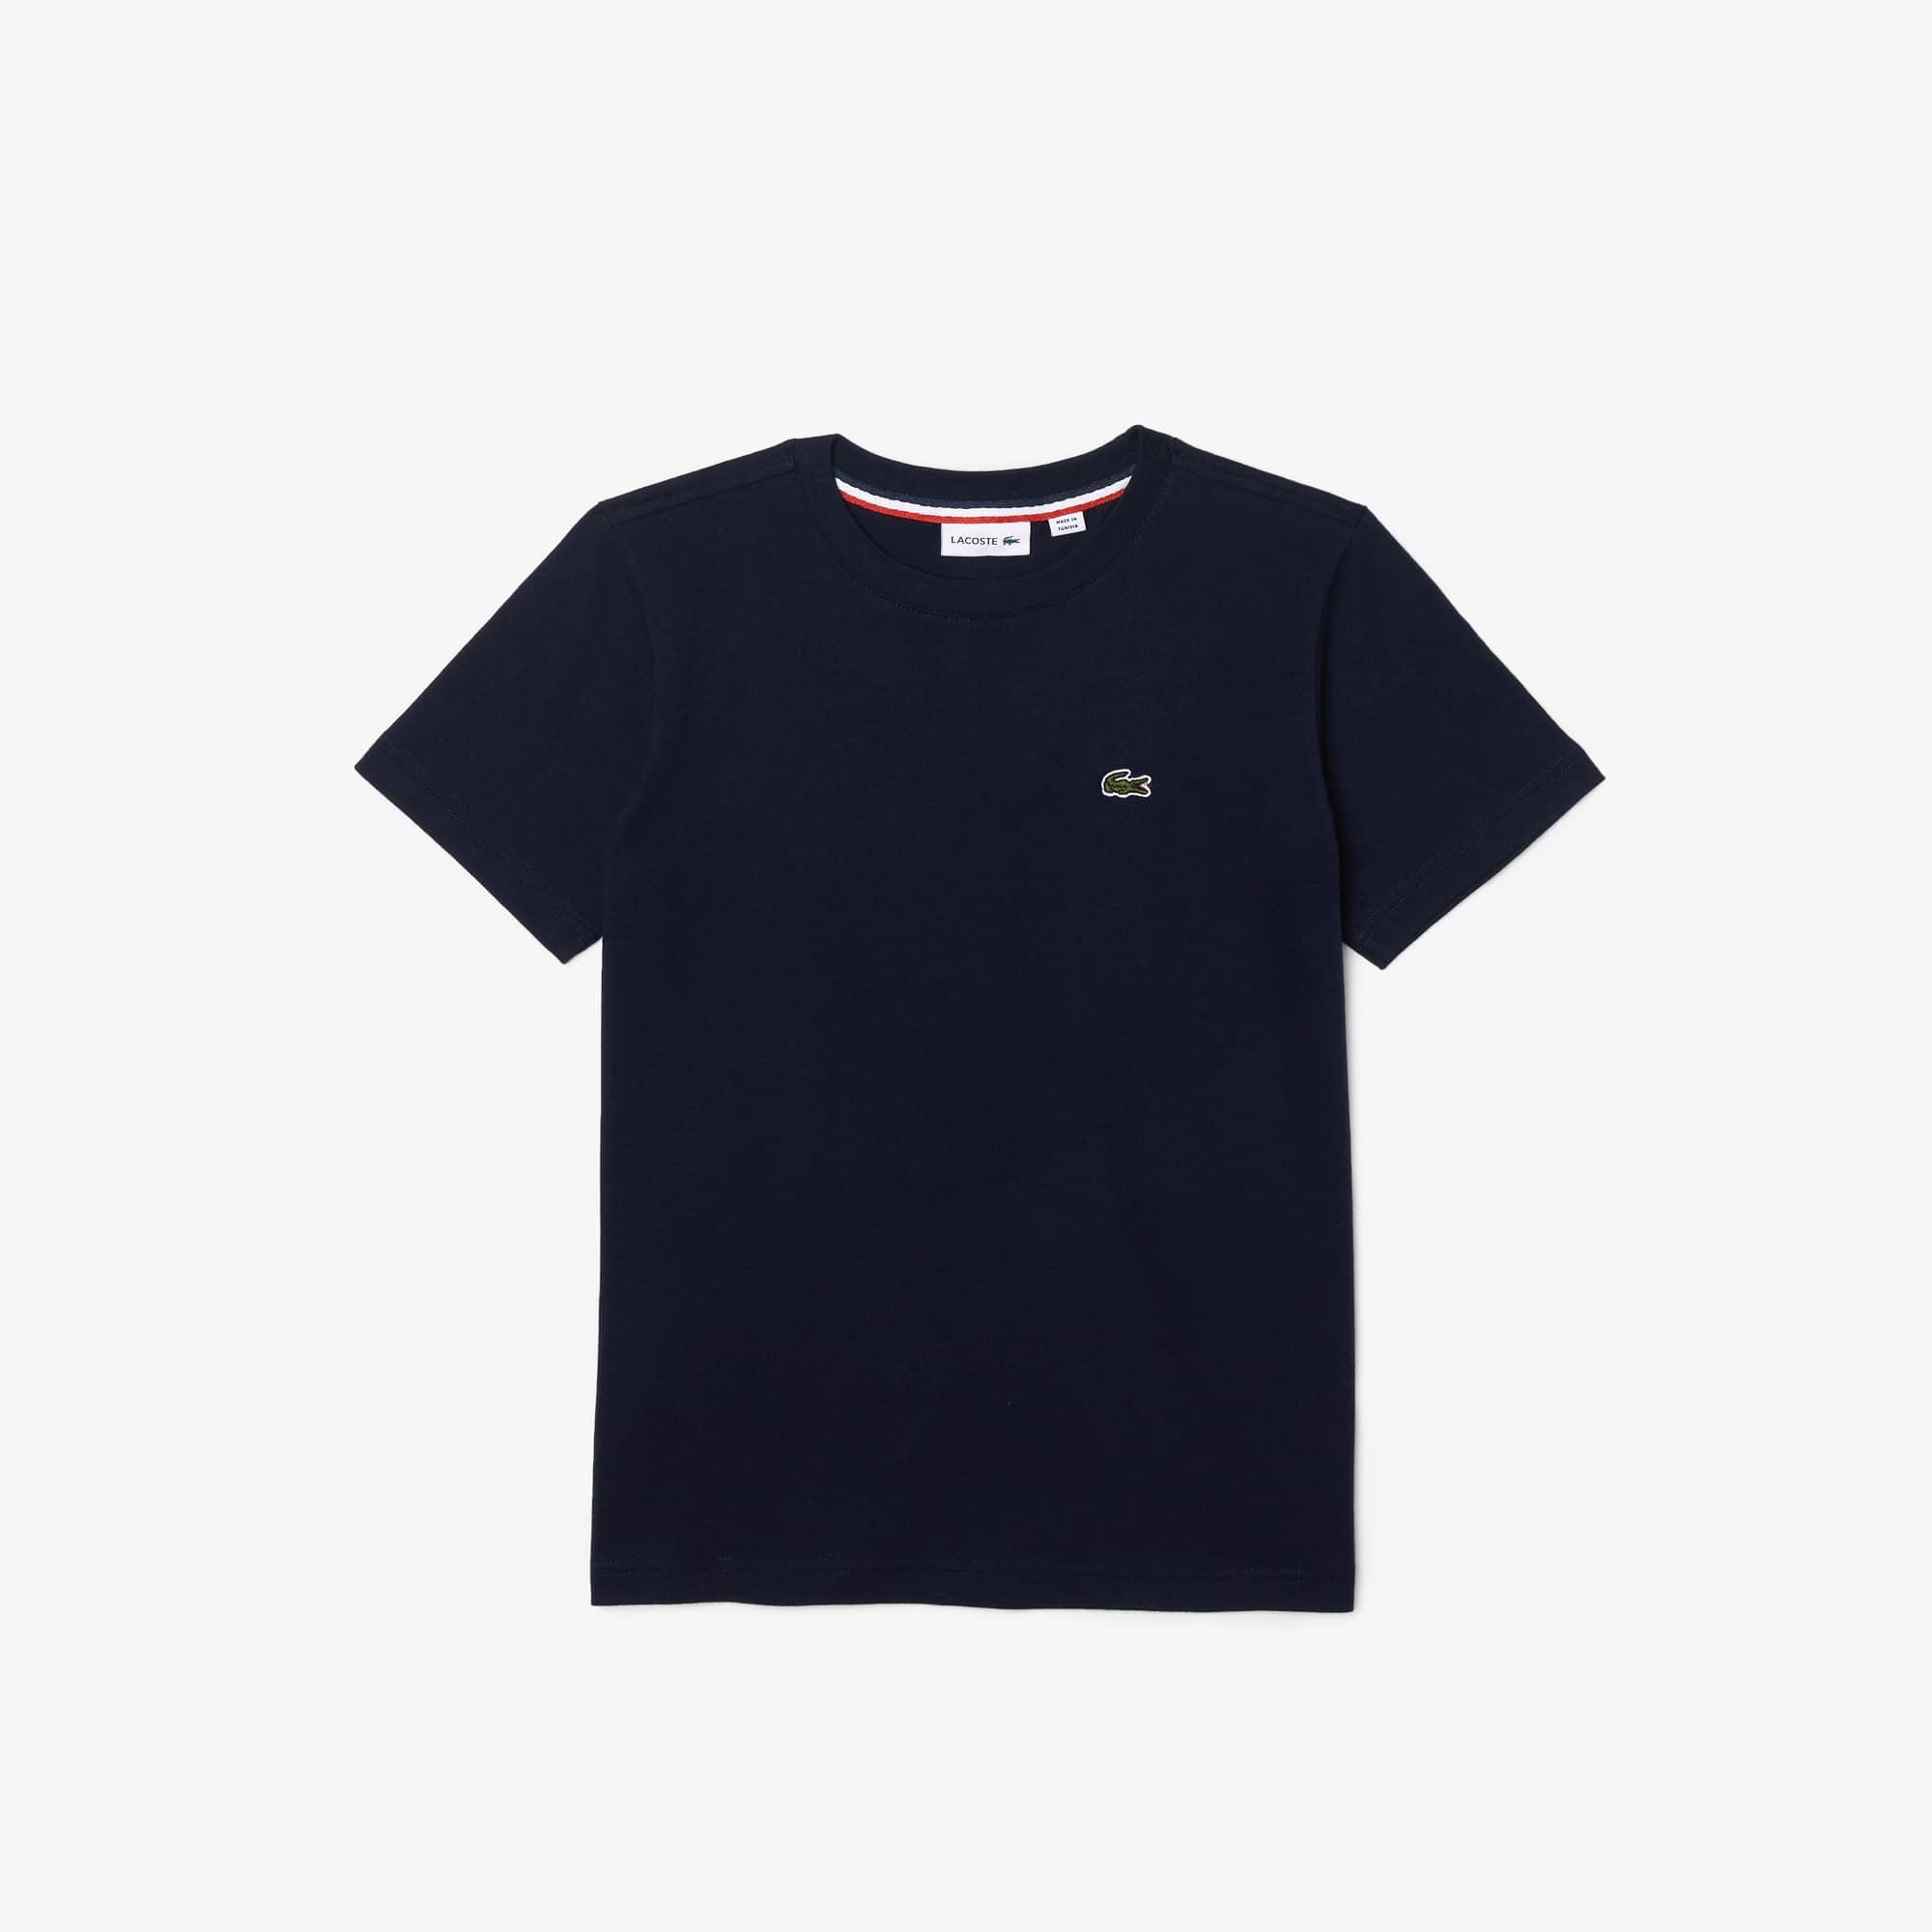 Boys' Crew Neck Cotton Jersey T-shirt